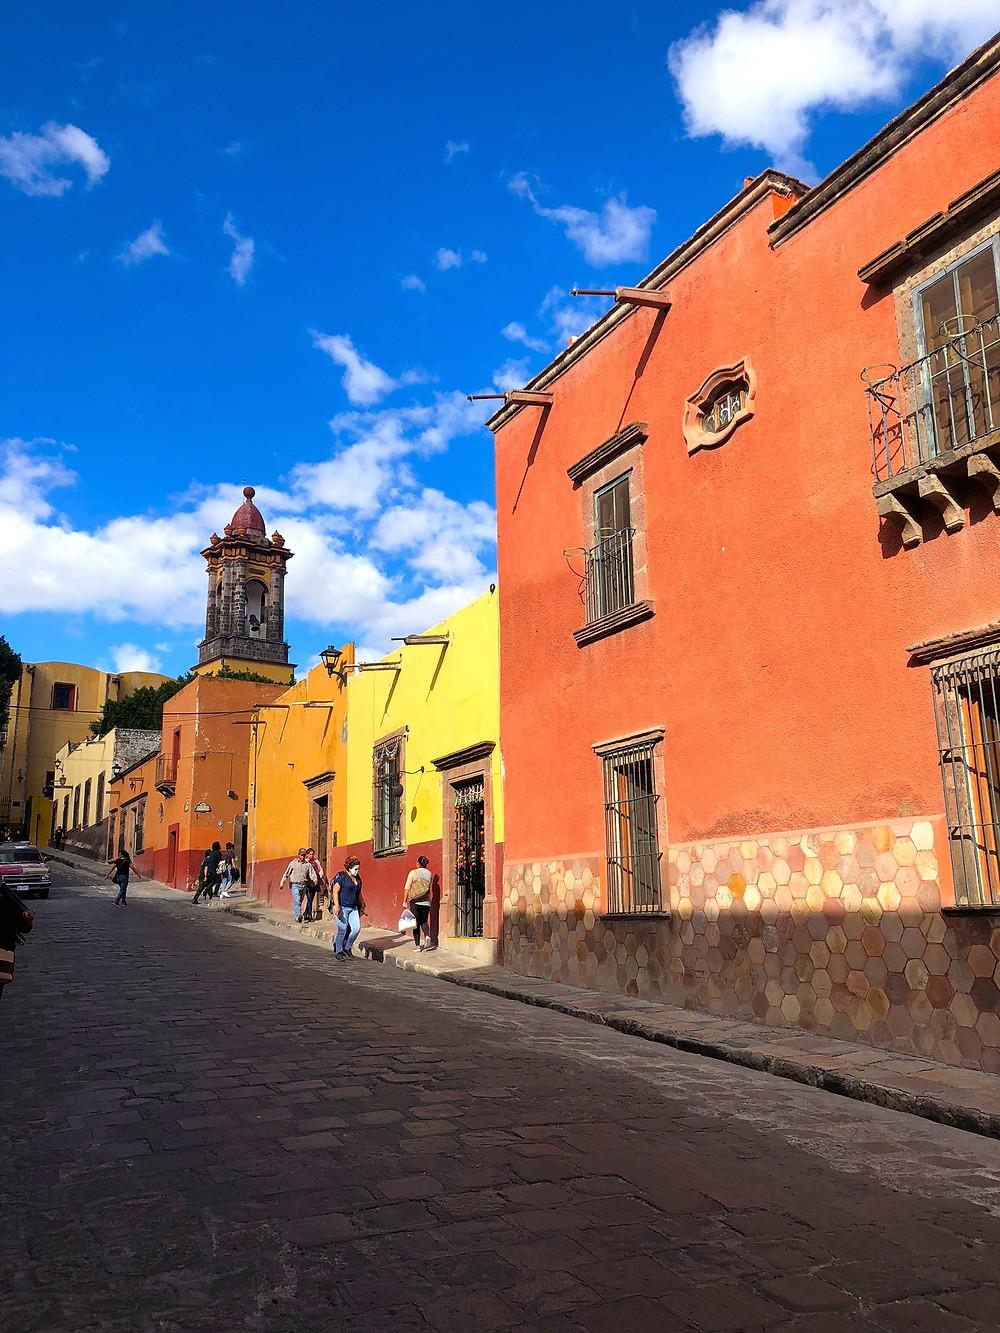 Amazing Colored Buildings and Cobblestone Streets of San Miguel de Allende